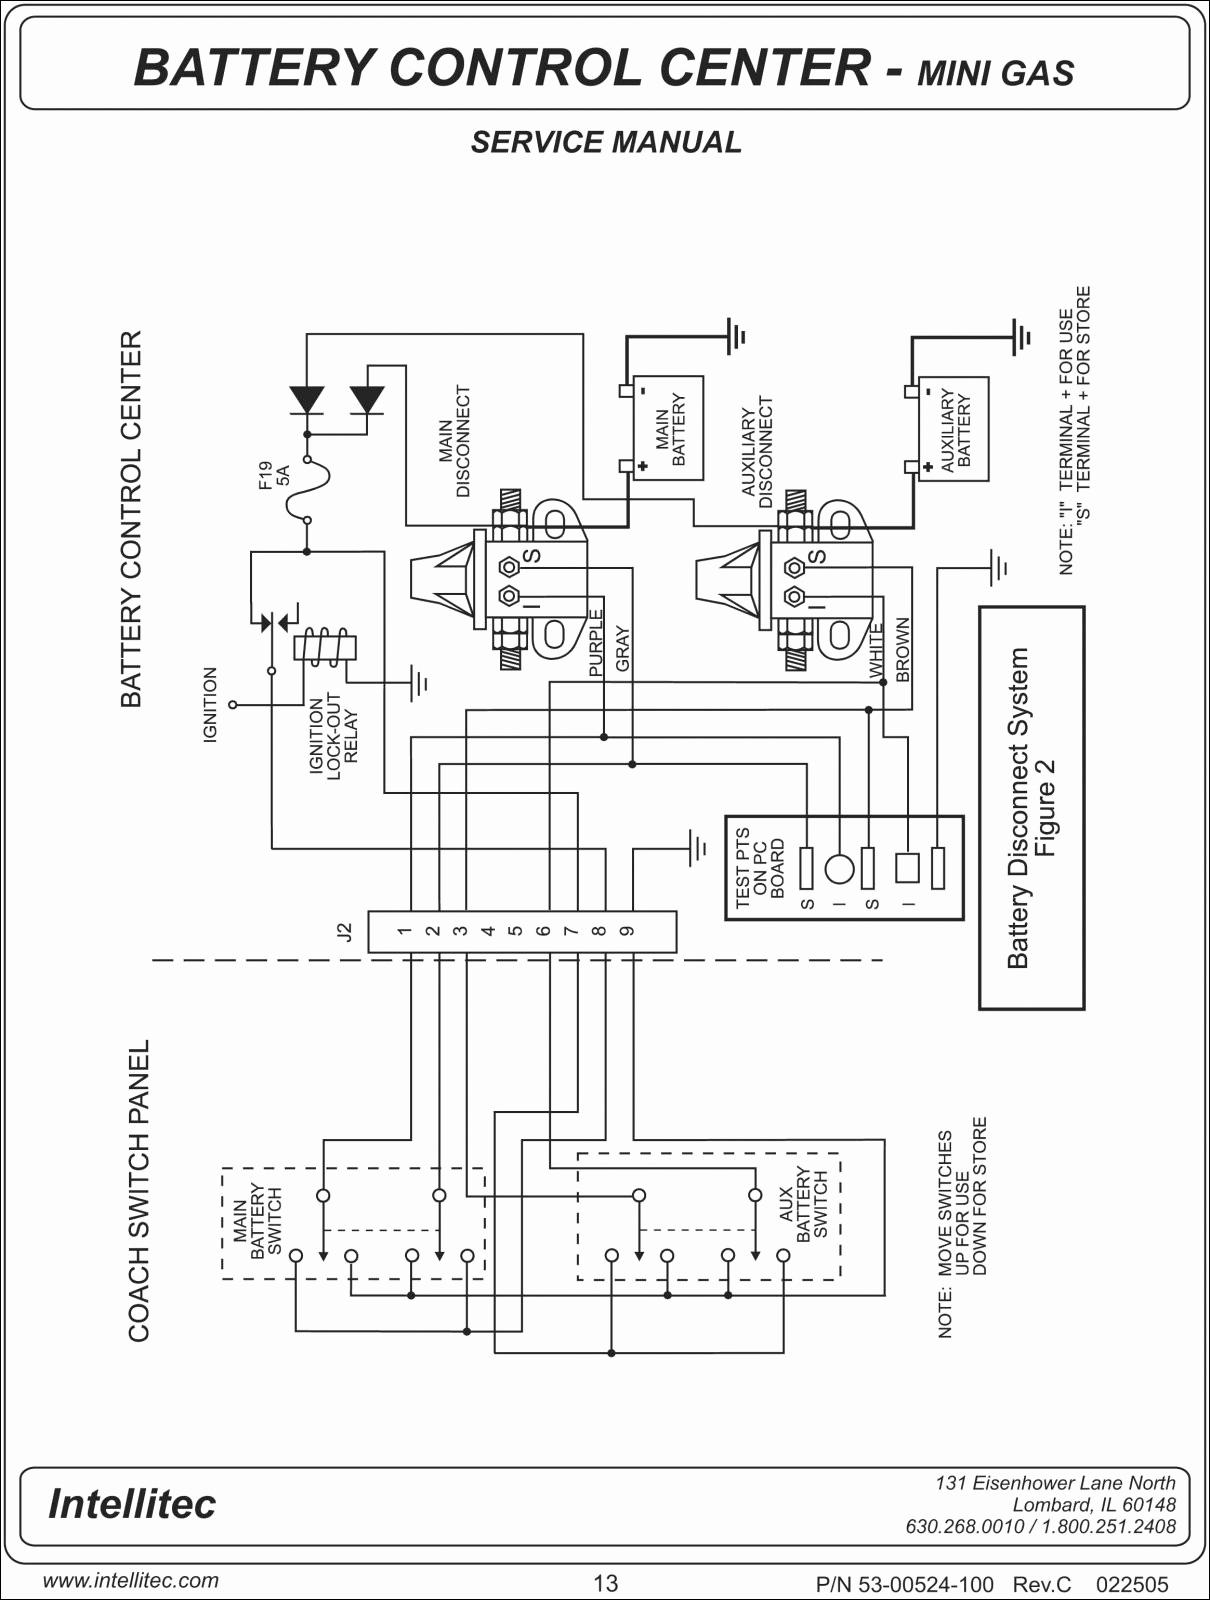 Get Generac 200 Amp Transfer Switch Wiring Diagram Sample - Generac 200 Amp Transfer Switch Wiring Diagram